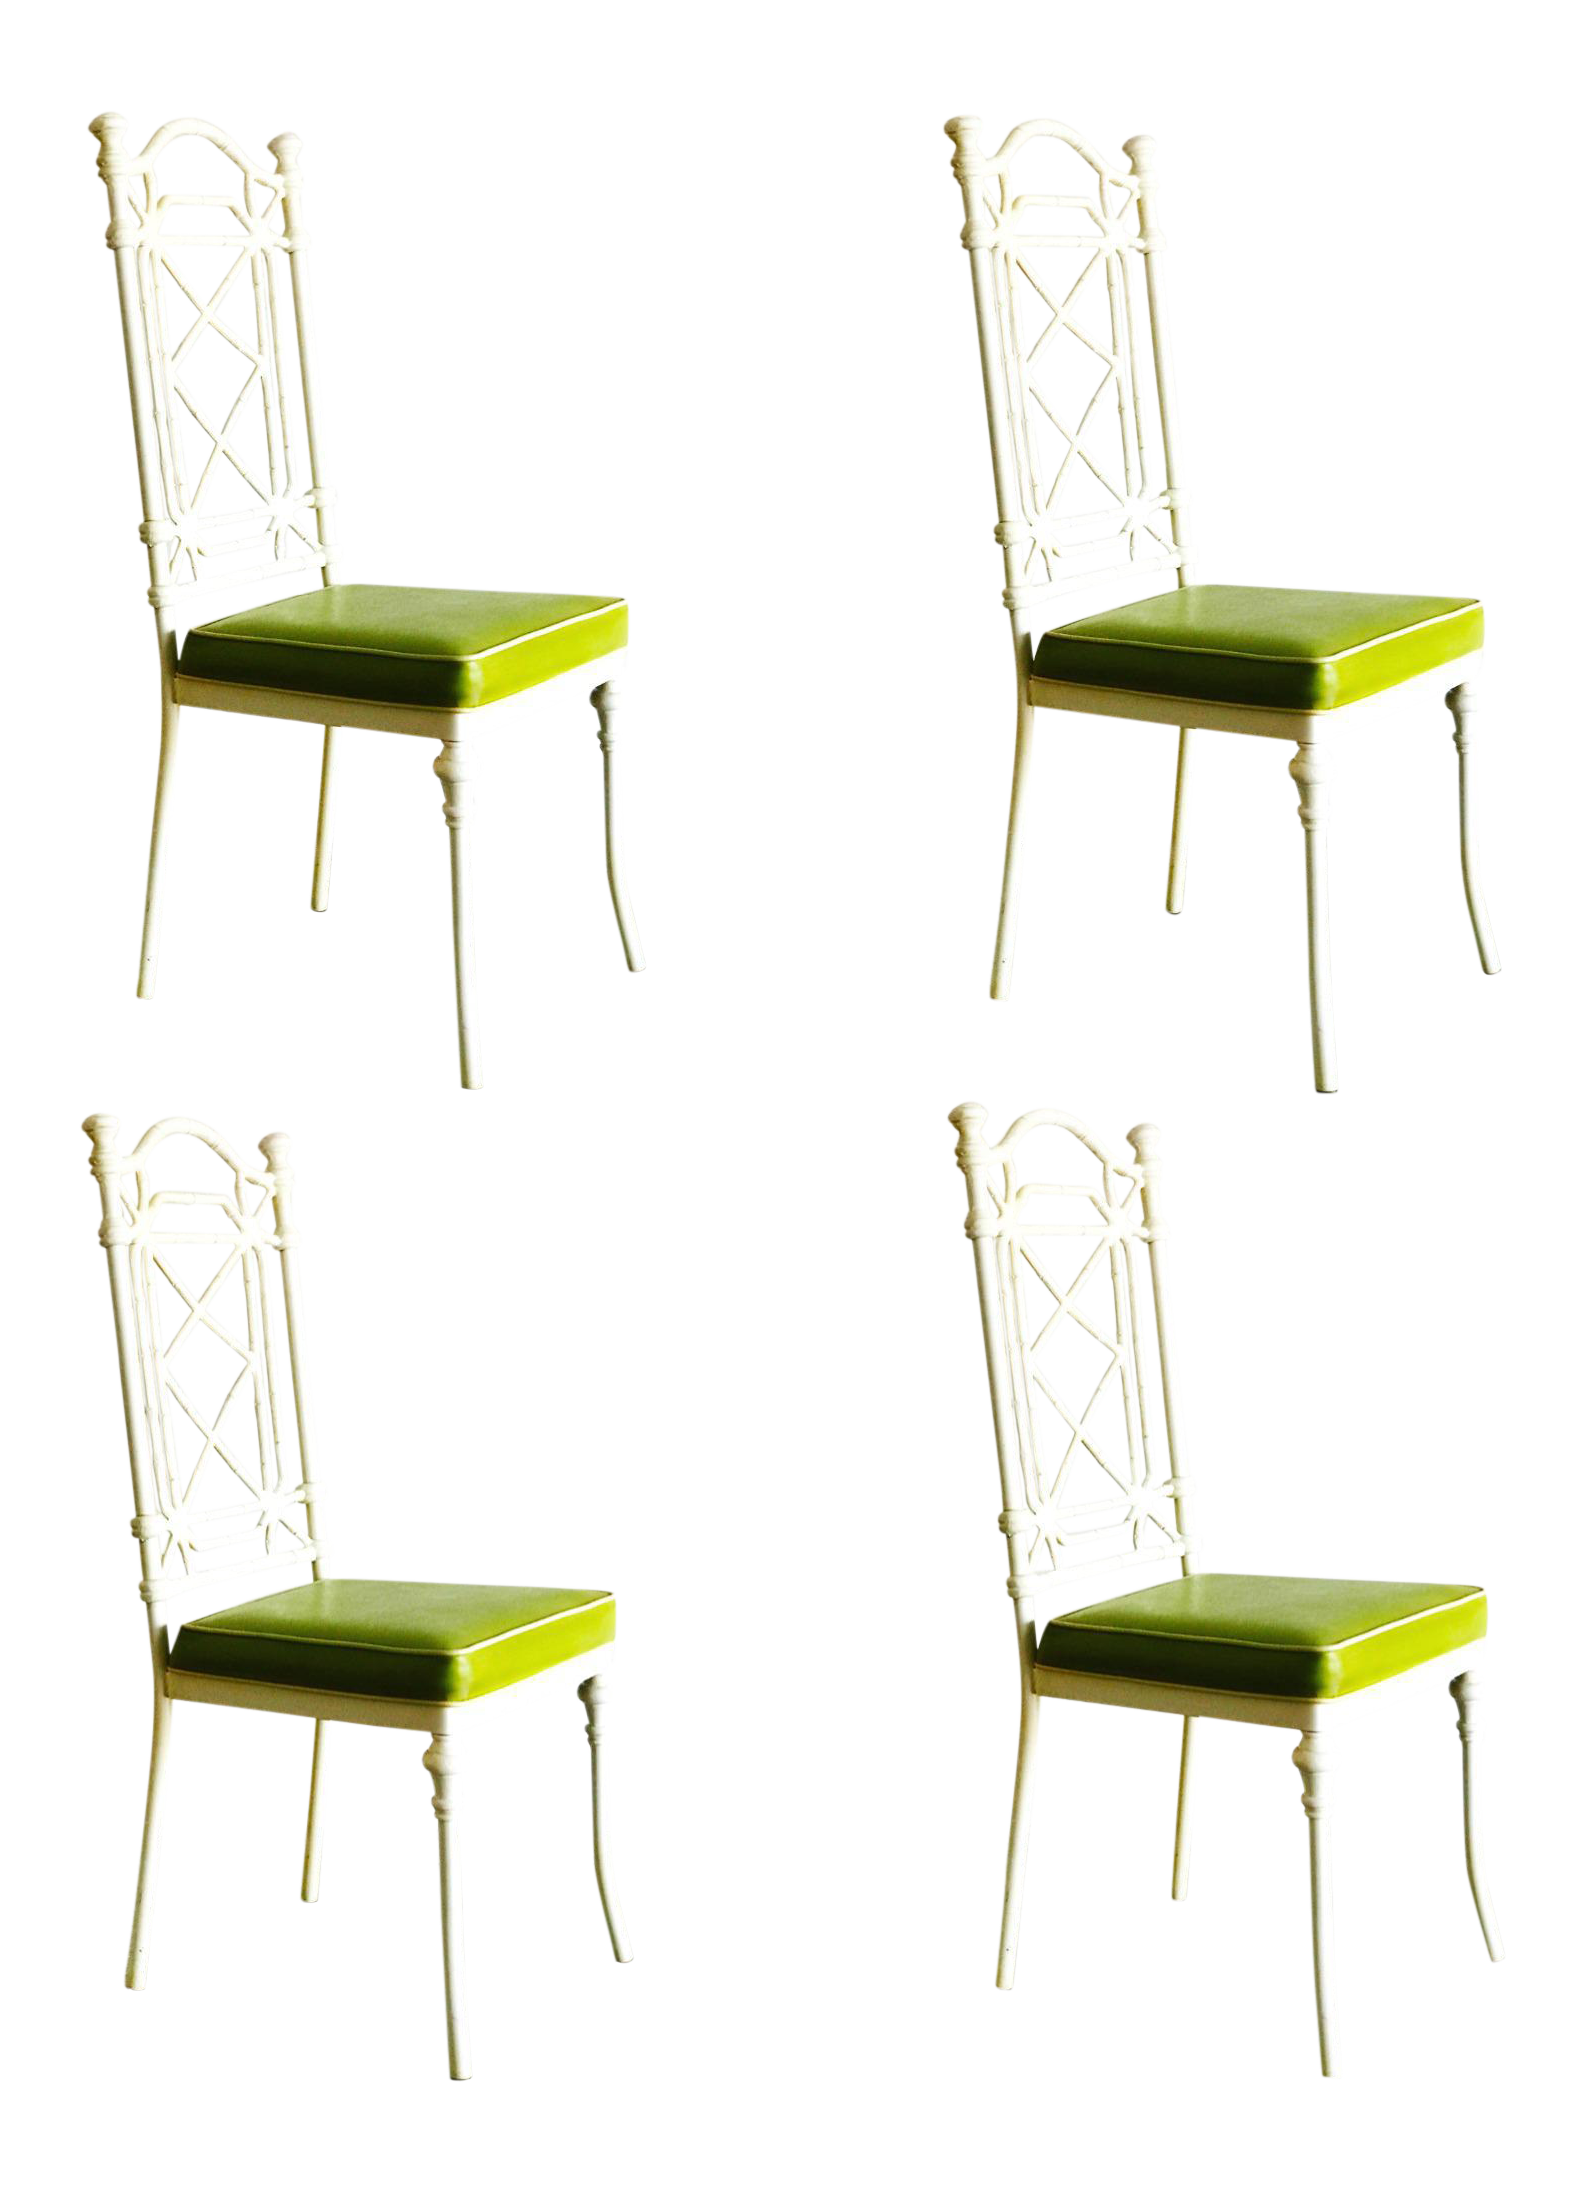 Fine Kessler Cast Iron Bamboo Chairs Set Of Four Furniture We Home Remodeling Inspirations Basidirectenergyitoicom